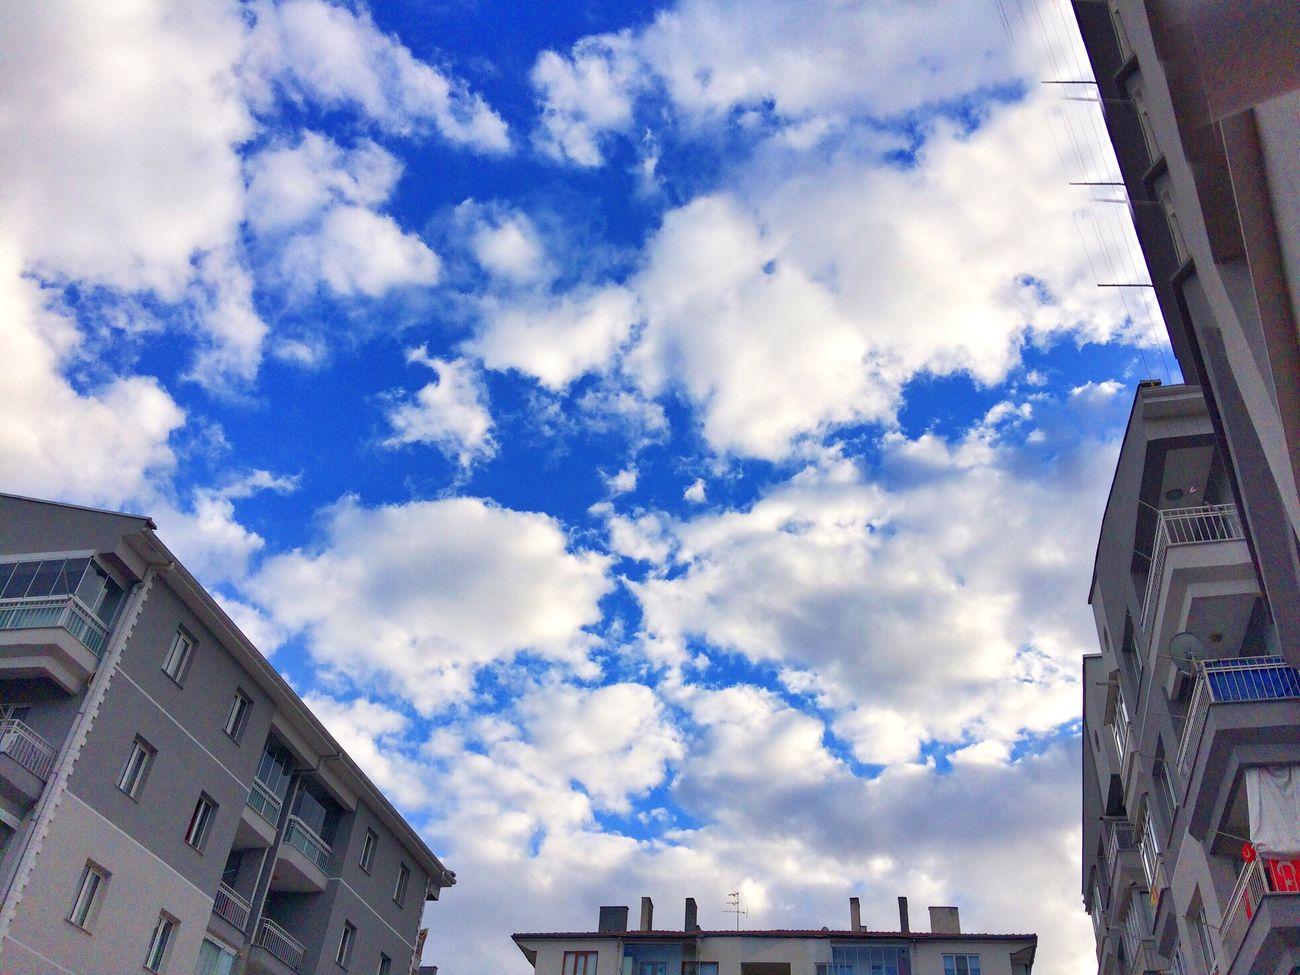 Sky Cloudslovers Nature Gokyuzu Blue Sky Bluelove Skyblue Skylovers Cloud - Sky Clouds